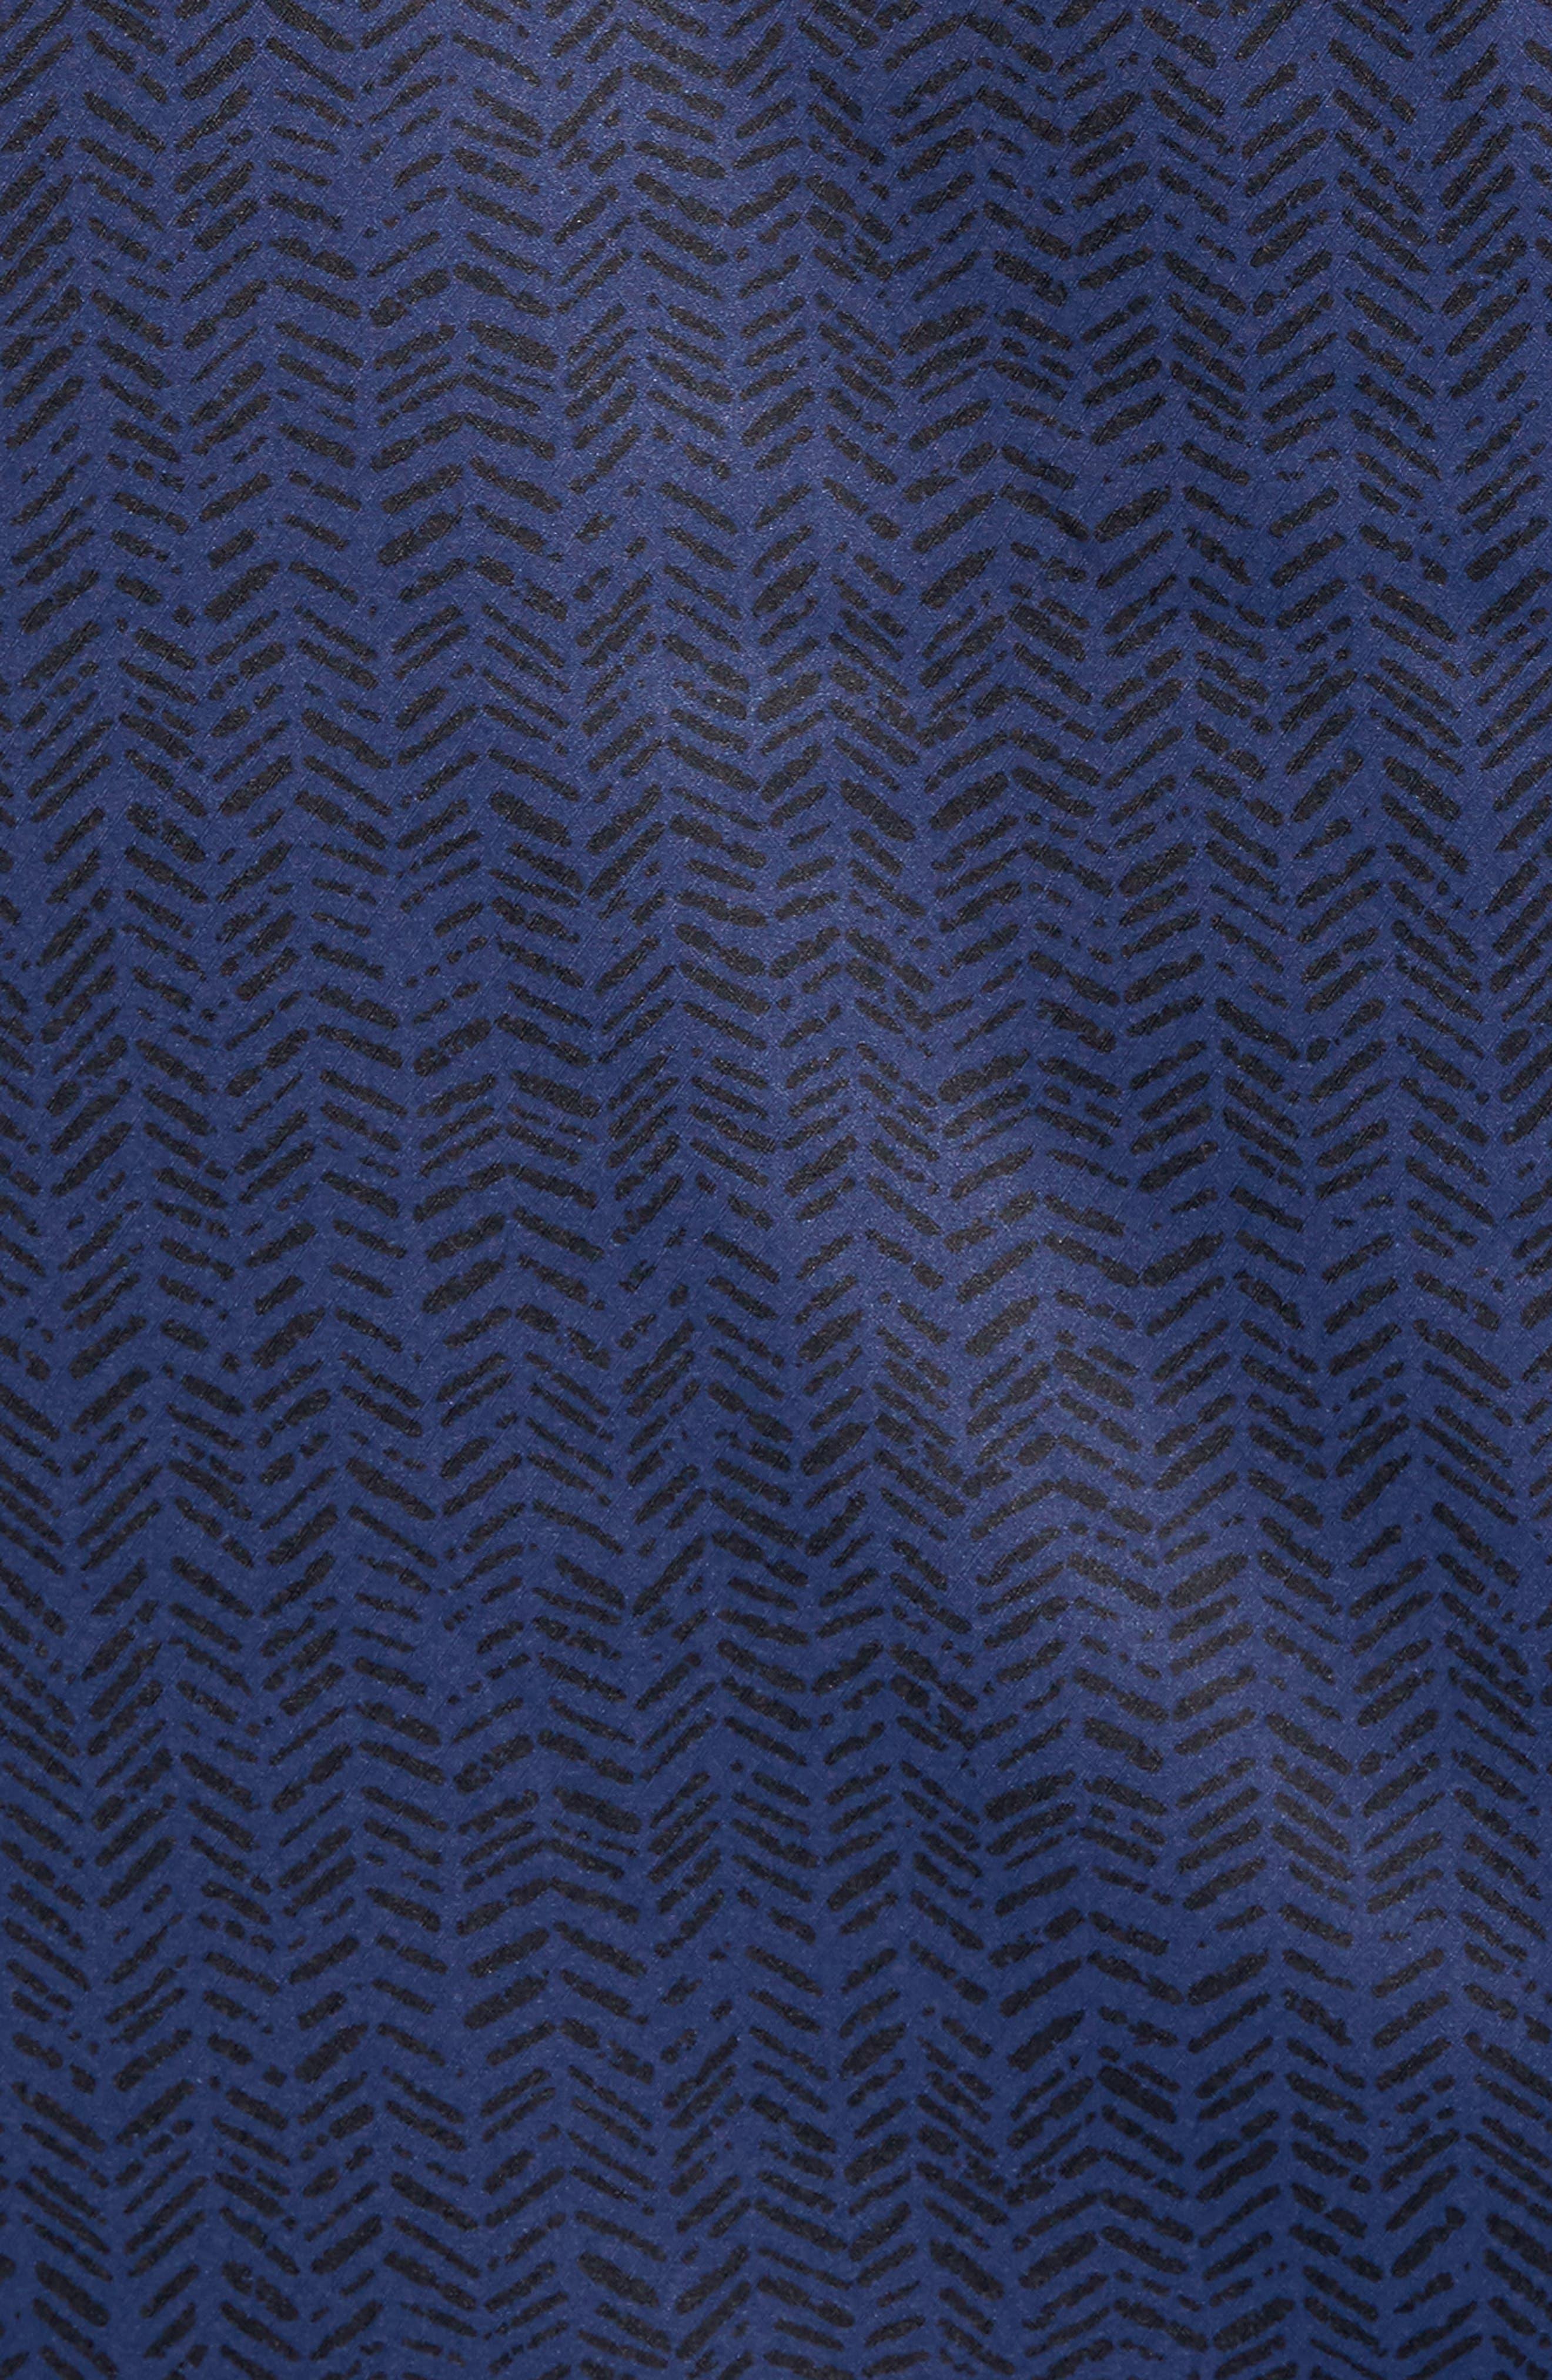 Herringbone Zip-Up Jacket,                             Alternate thumbnail 5, color,                             Navy Blue/ Navy Blue